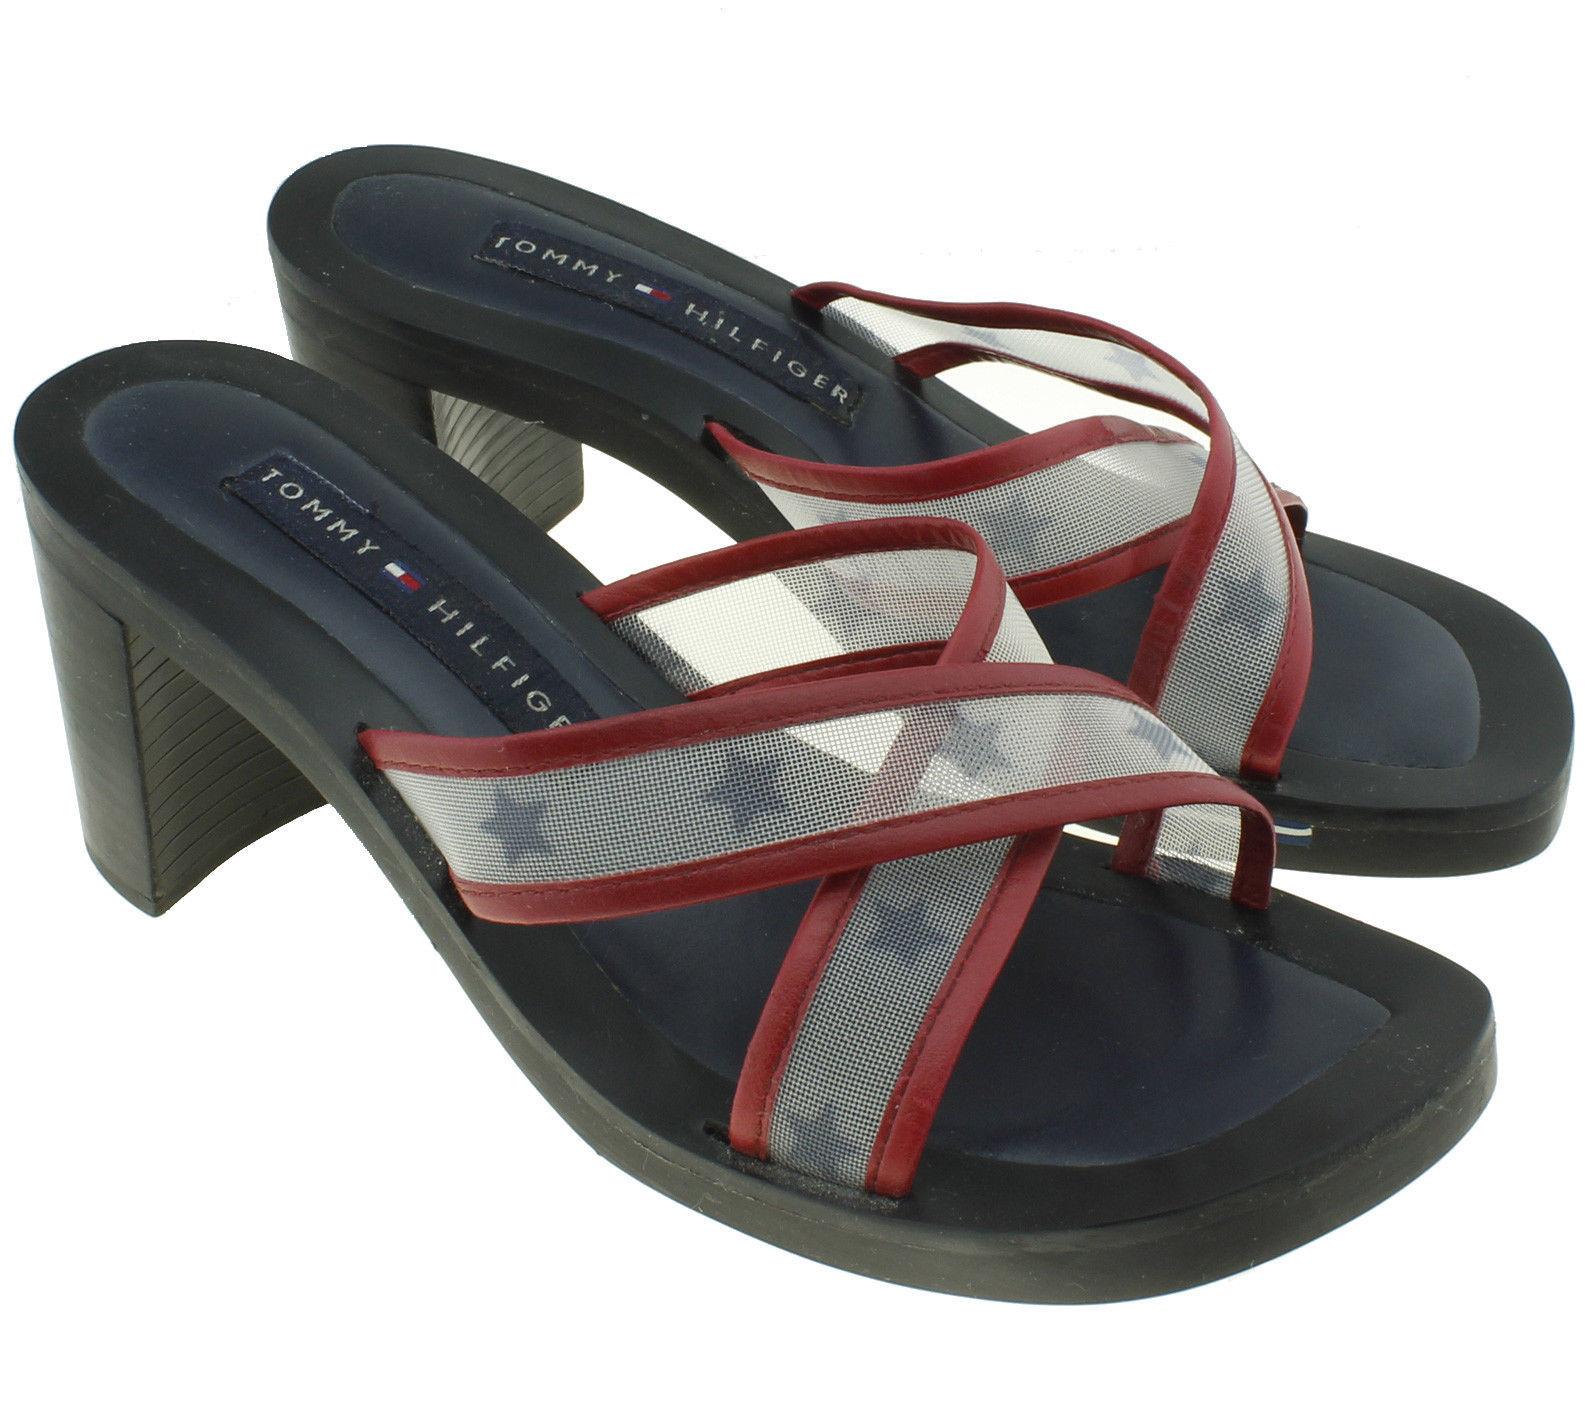 a5981677d25 Tommy Hilfiger Size 7.5 Women s Vintage Red White Blue Star Heels Sandals -   20.44